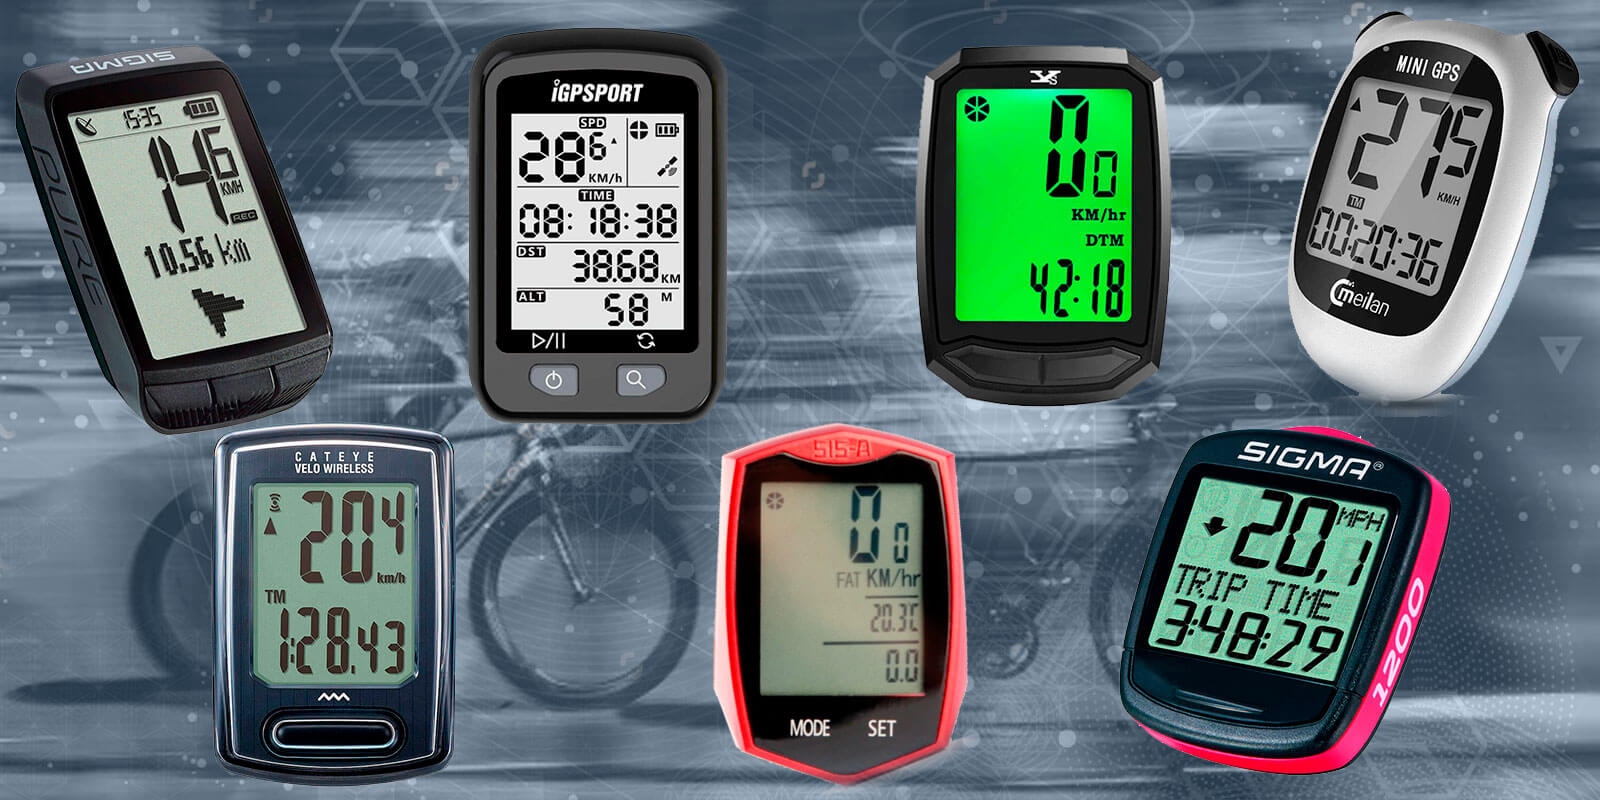 mejores cuentakilometros para bici